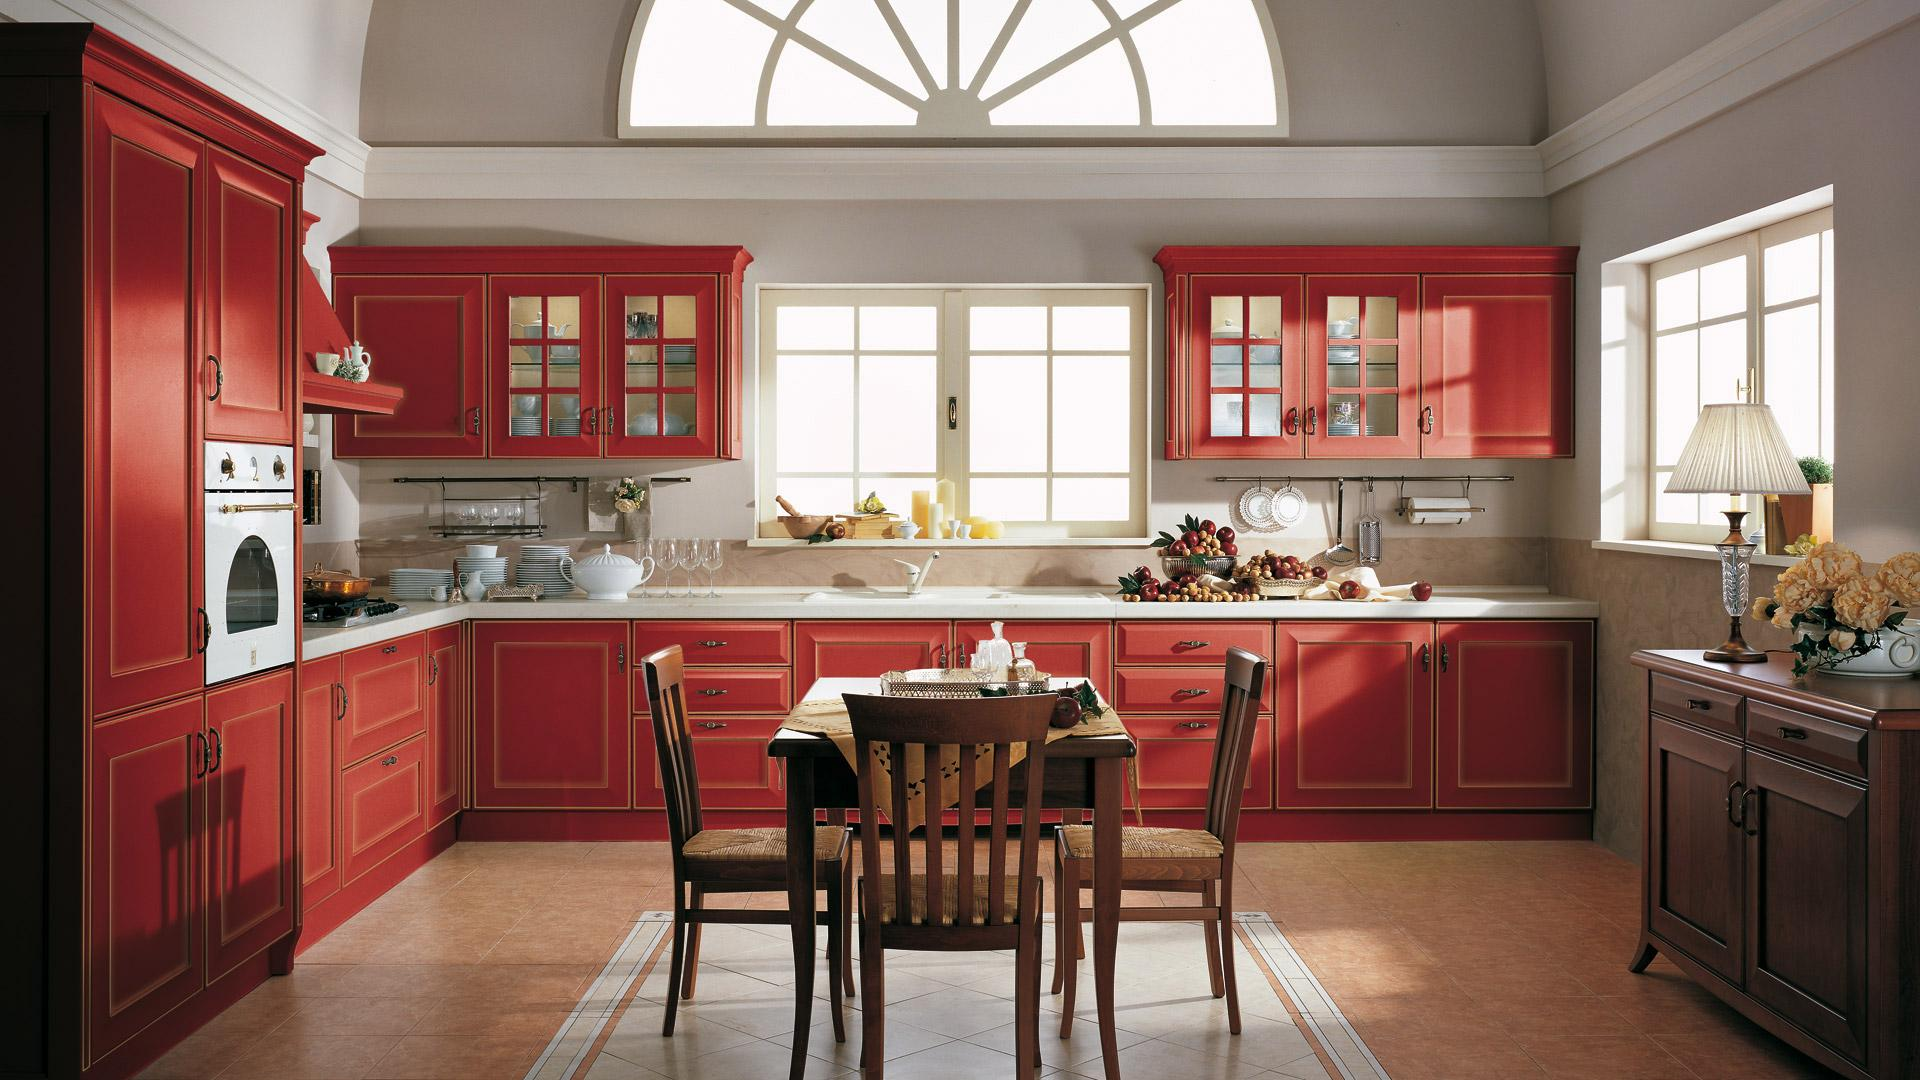 Cucina rustica le soluzioni classiche di lube store per for Modelli di sedie per cucina